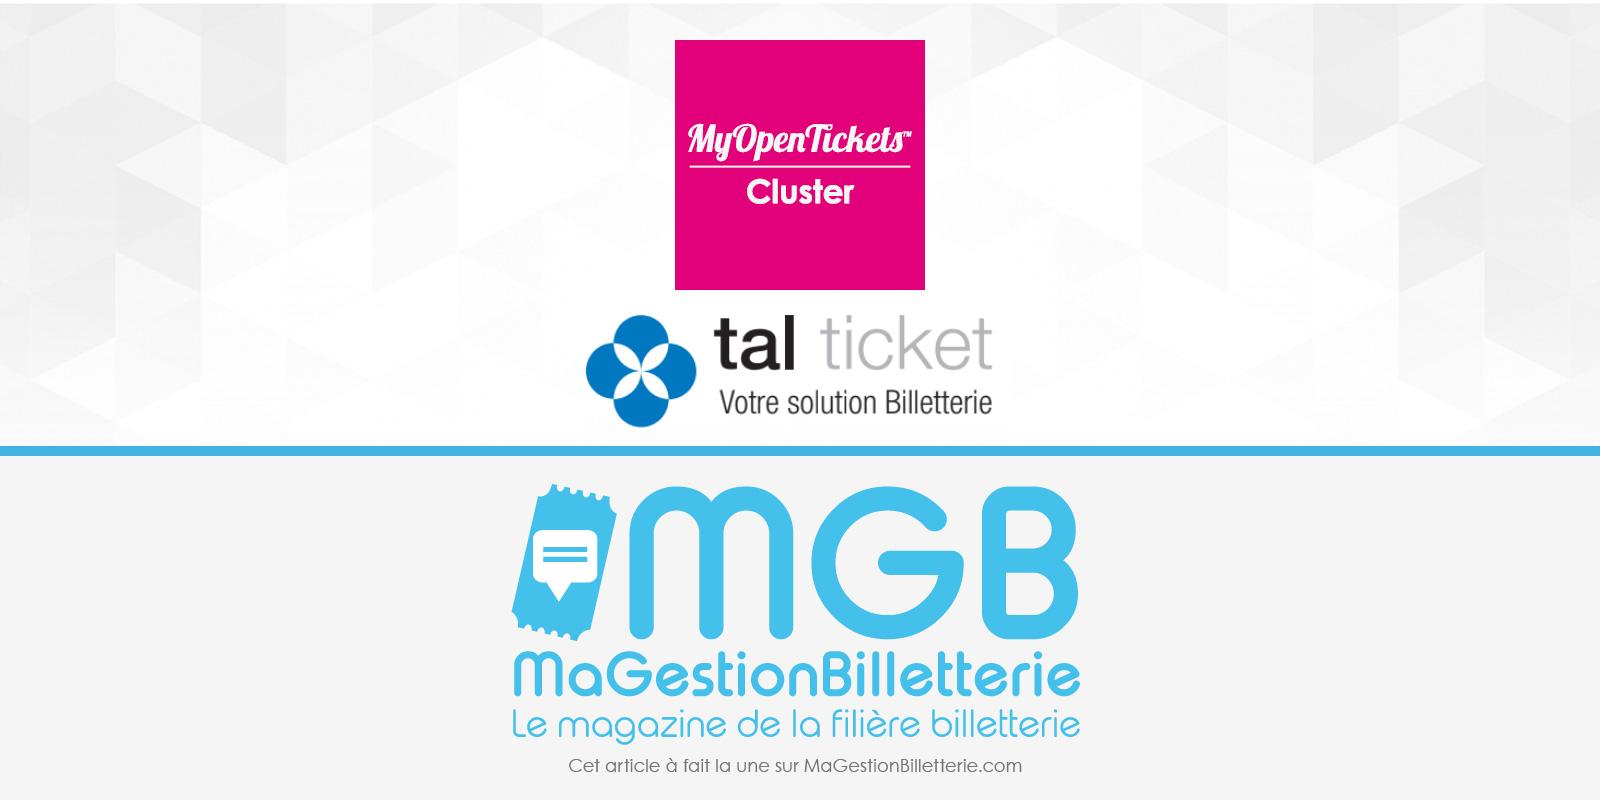 myopentickets-cluster-talticket-une6